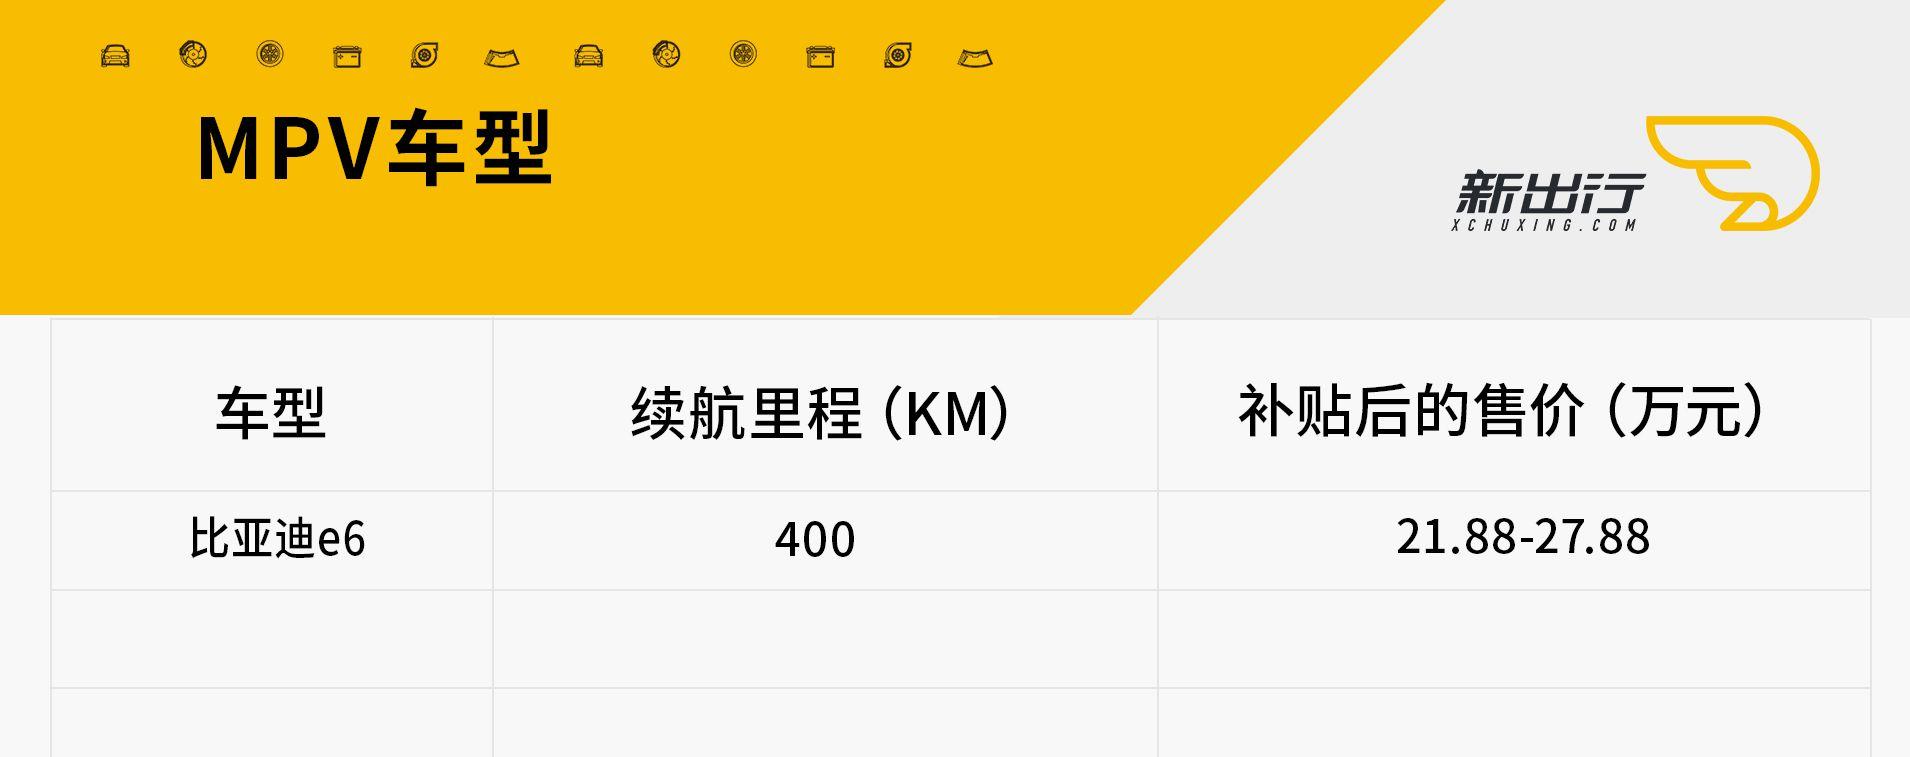 MPV_副本.jpg